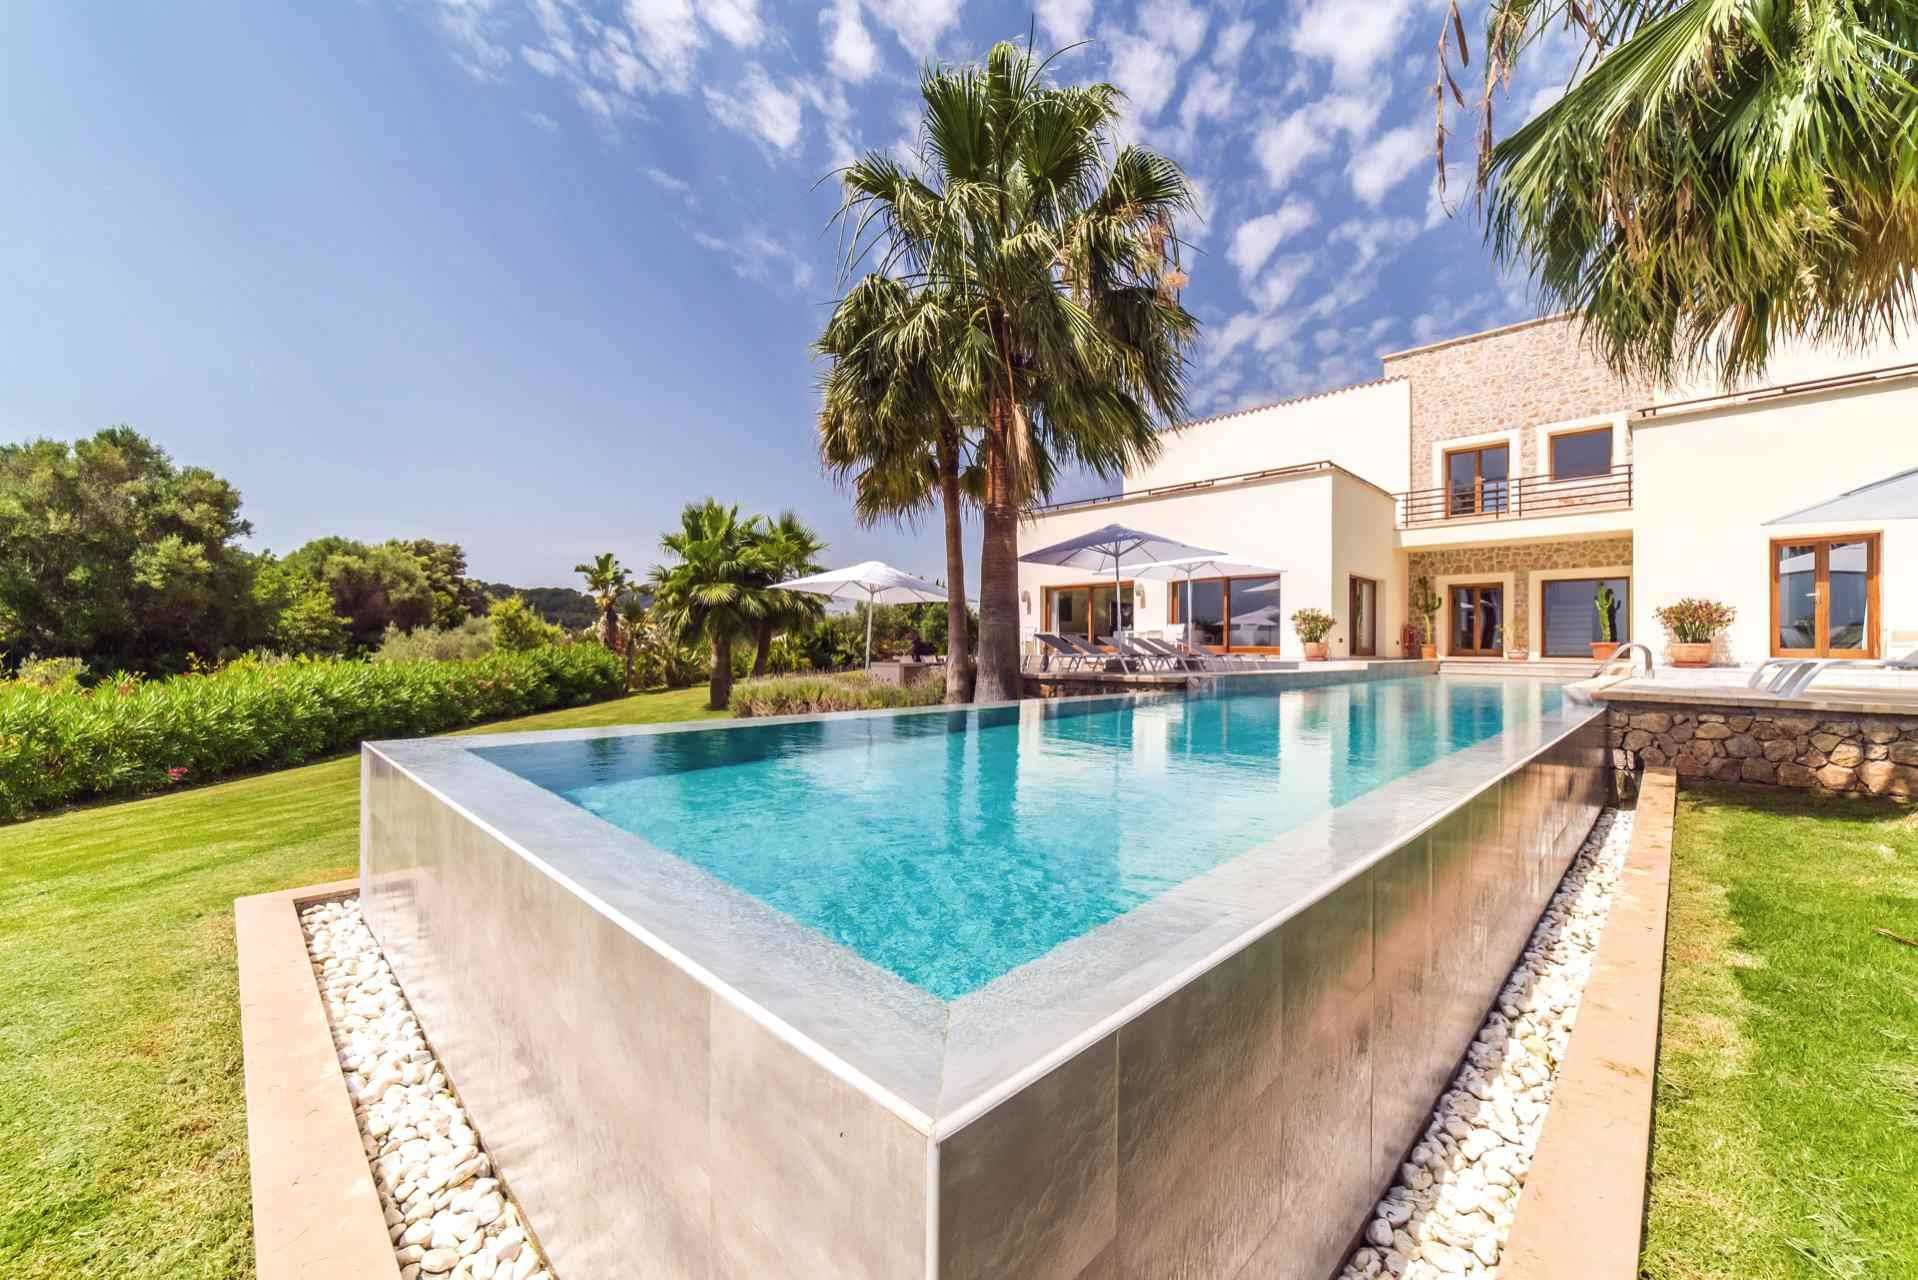 01-28 Luxus Finca Mallorca Nordosten Bild 6